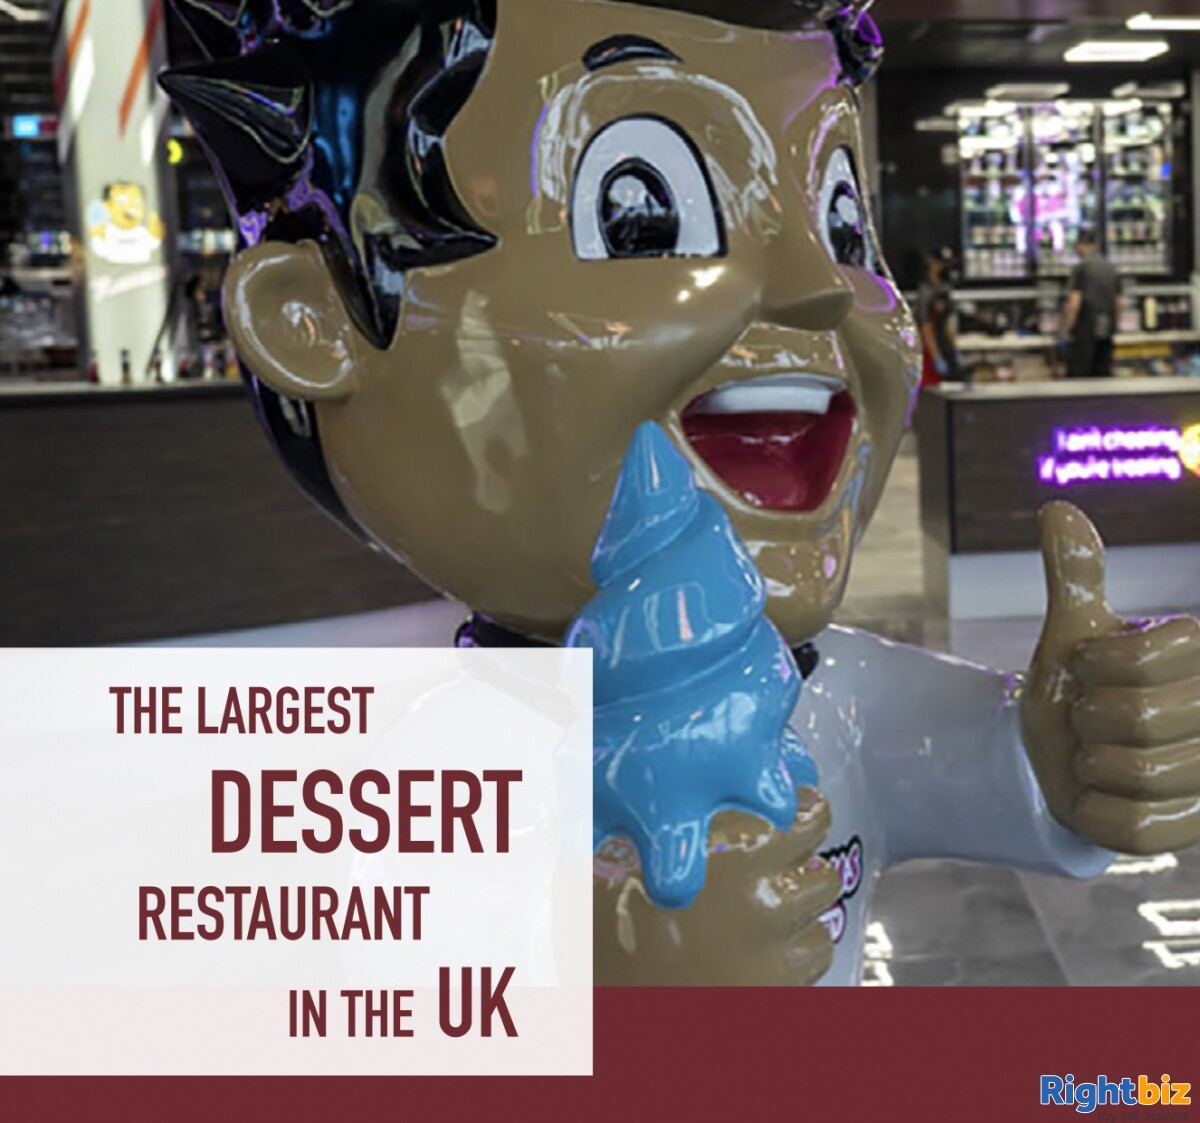 Halal, Vegan & Gluten Free Dessert Restaurant Franchise With Opportunities Nationwide - Image 1